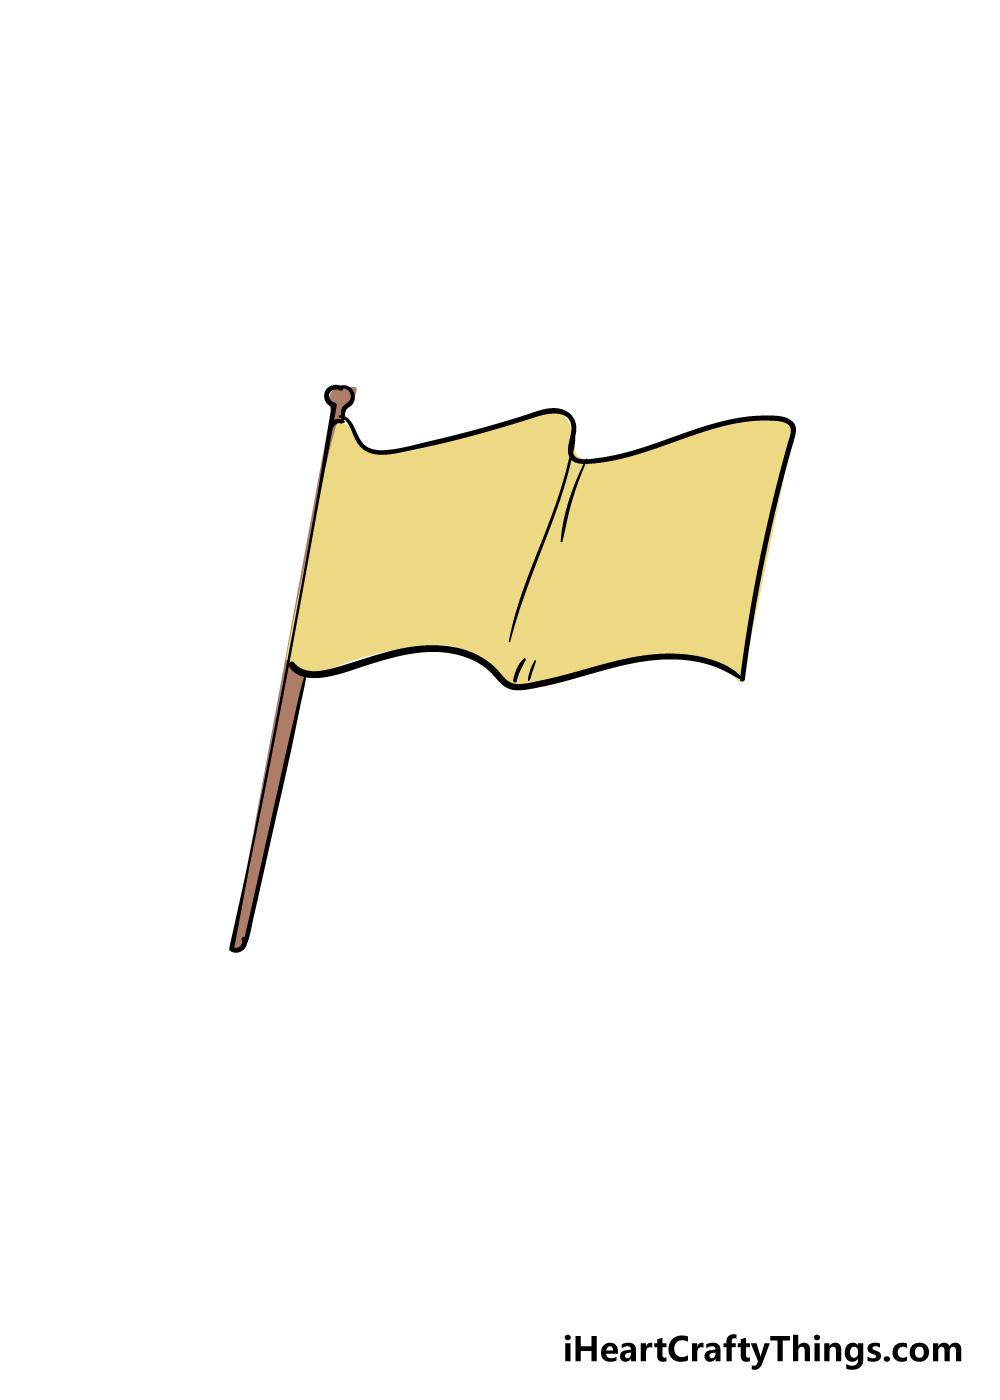 flag drawing step 6